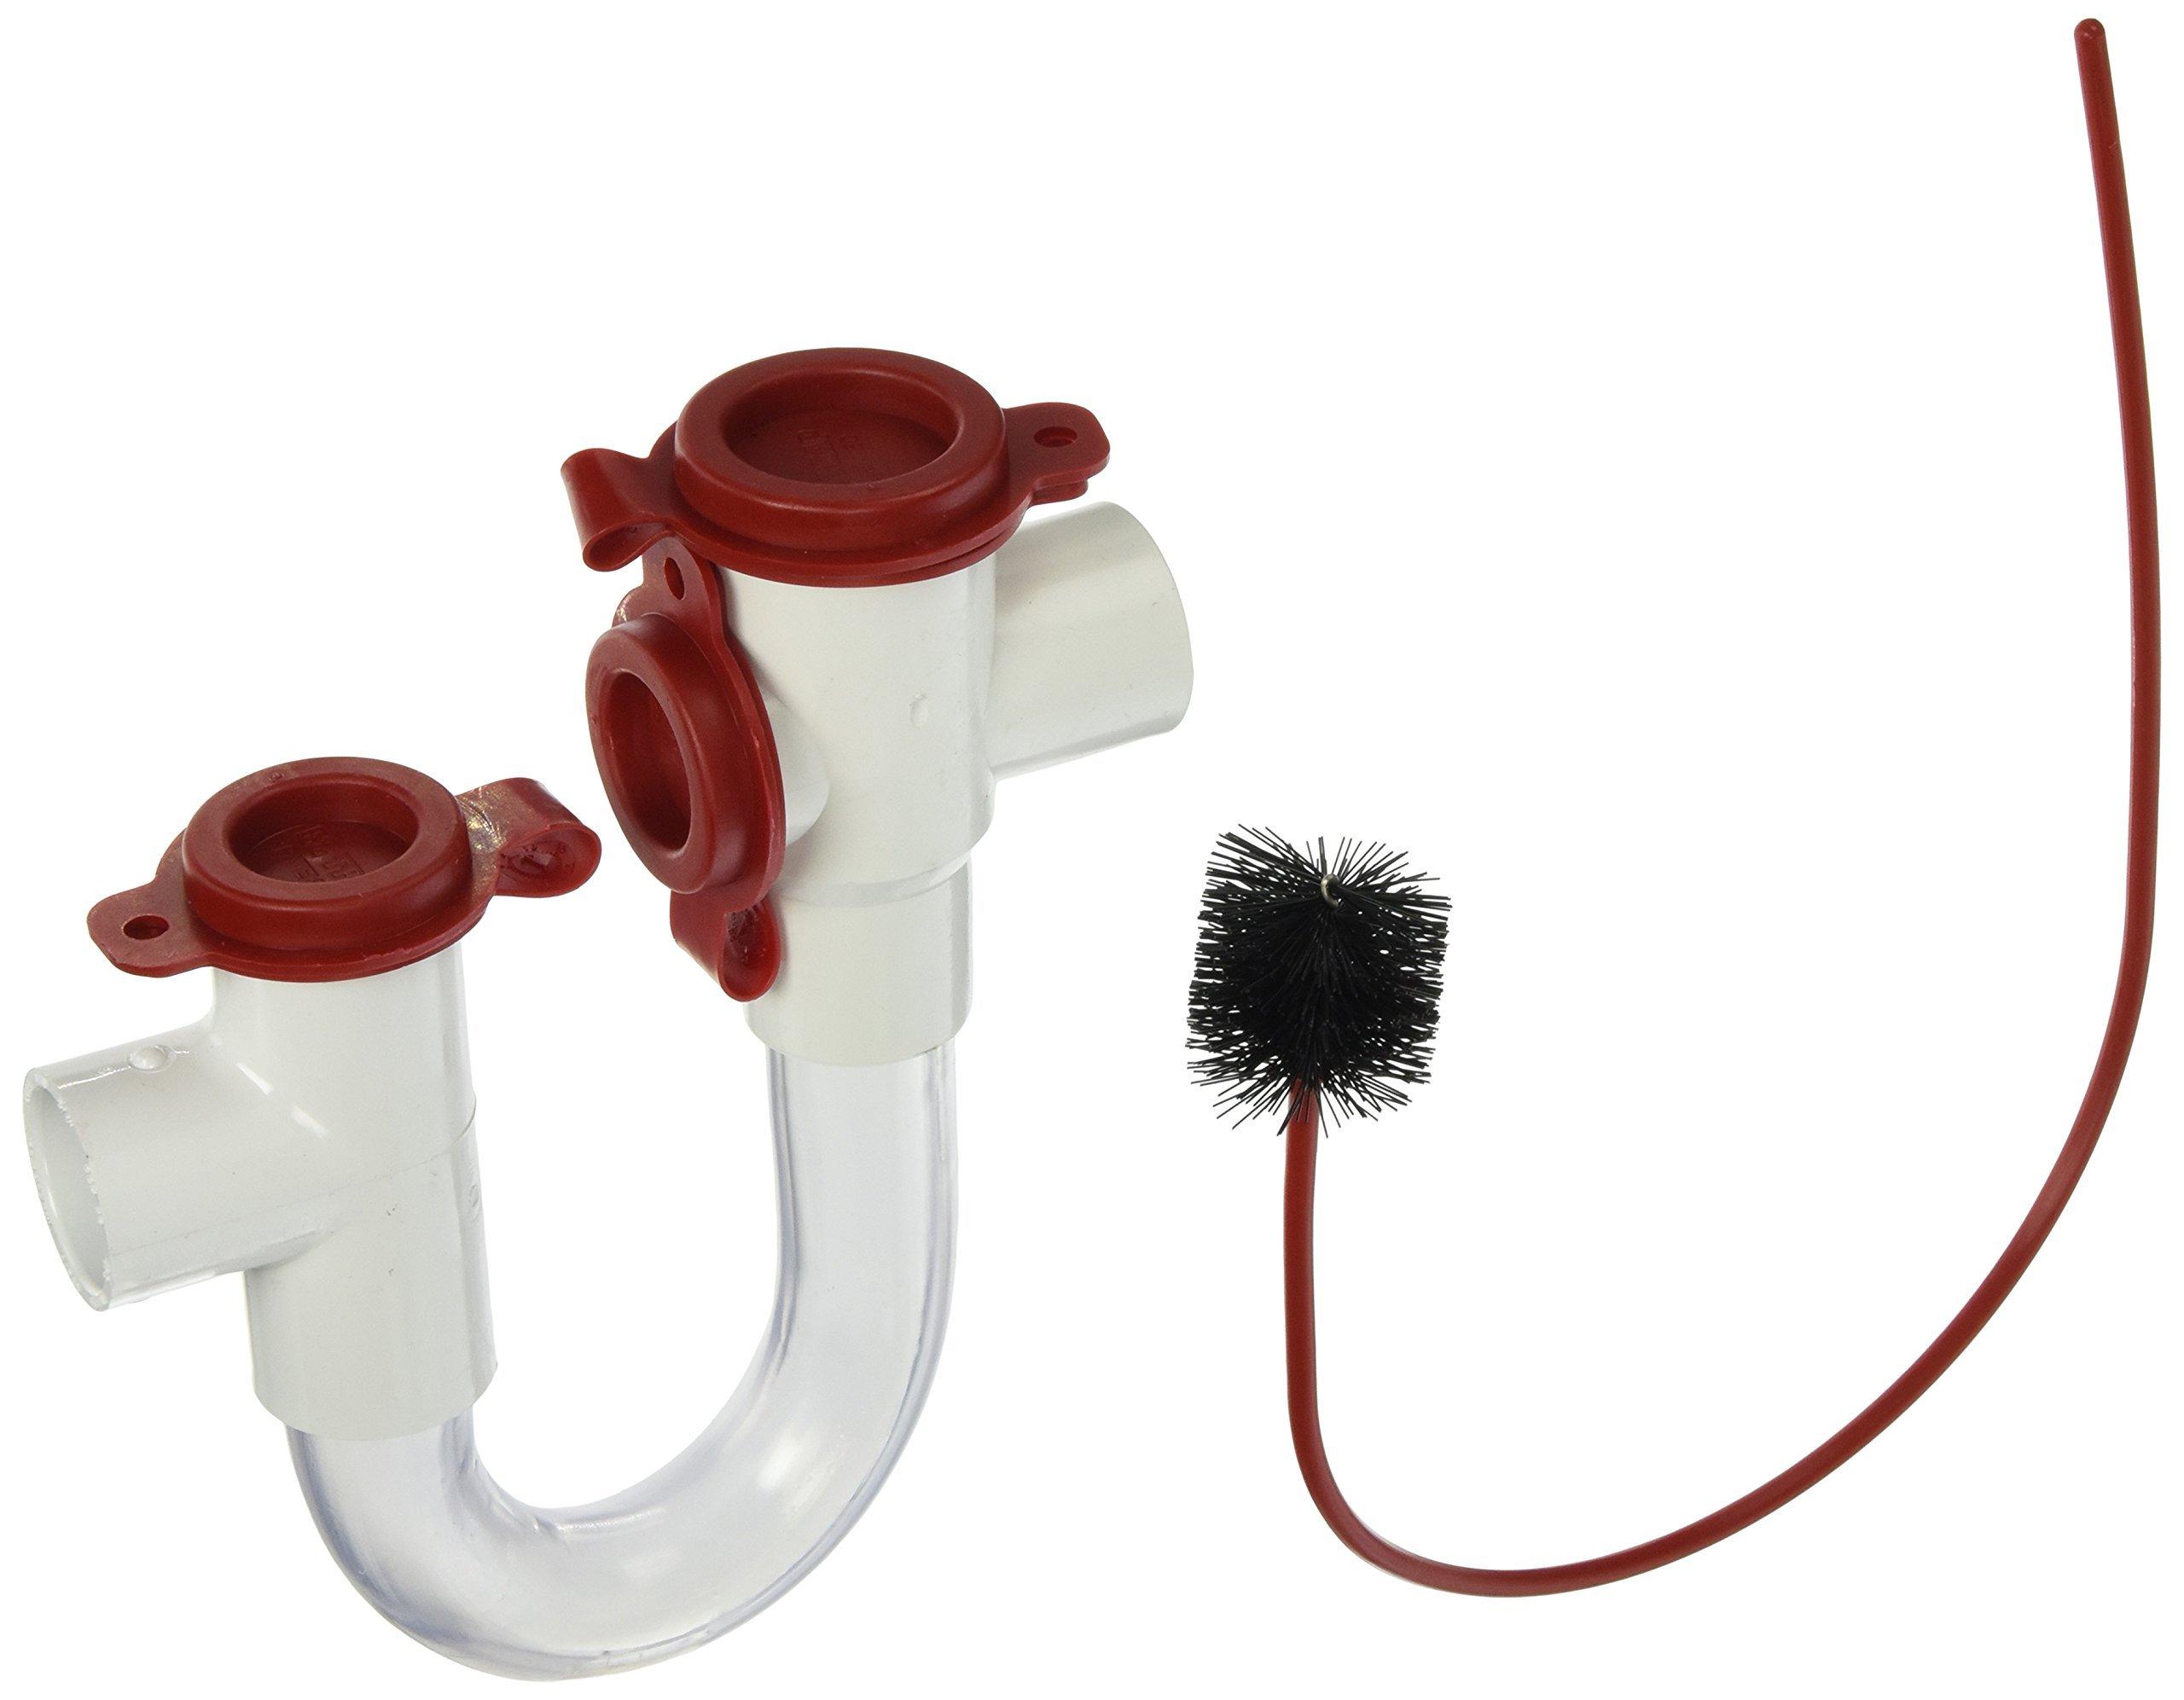 Rectorseal 83114 2 EZ 113B Trap Kit with Brush